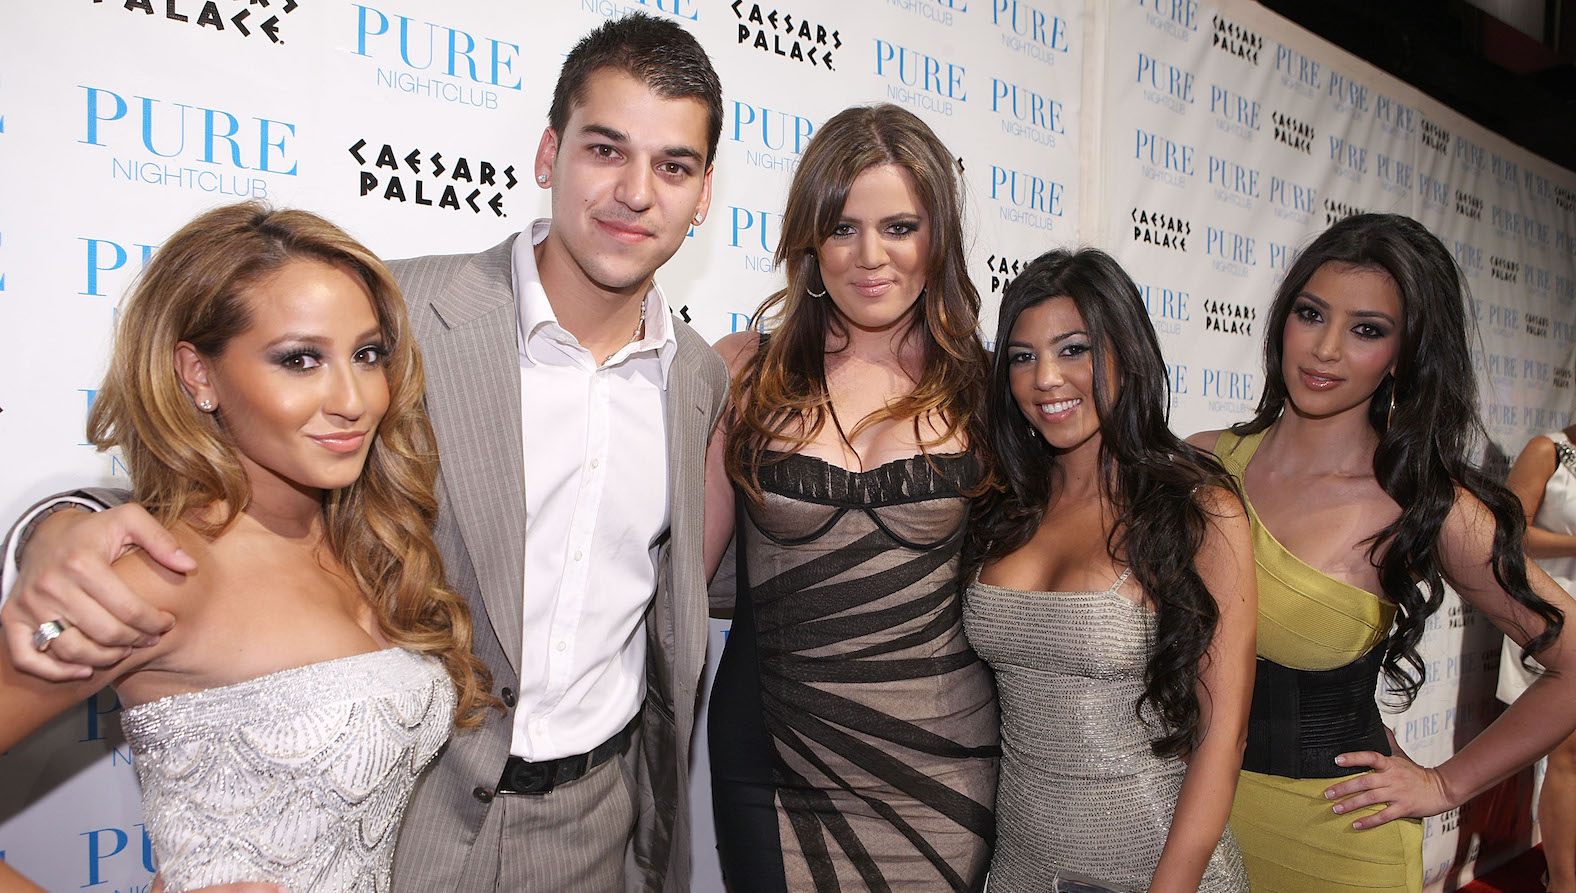 Adrienne Bailon datovania Rob Kardashian bol tak bolestivý Hollywood u rastúce hviezdy datovania Chris zimy